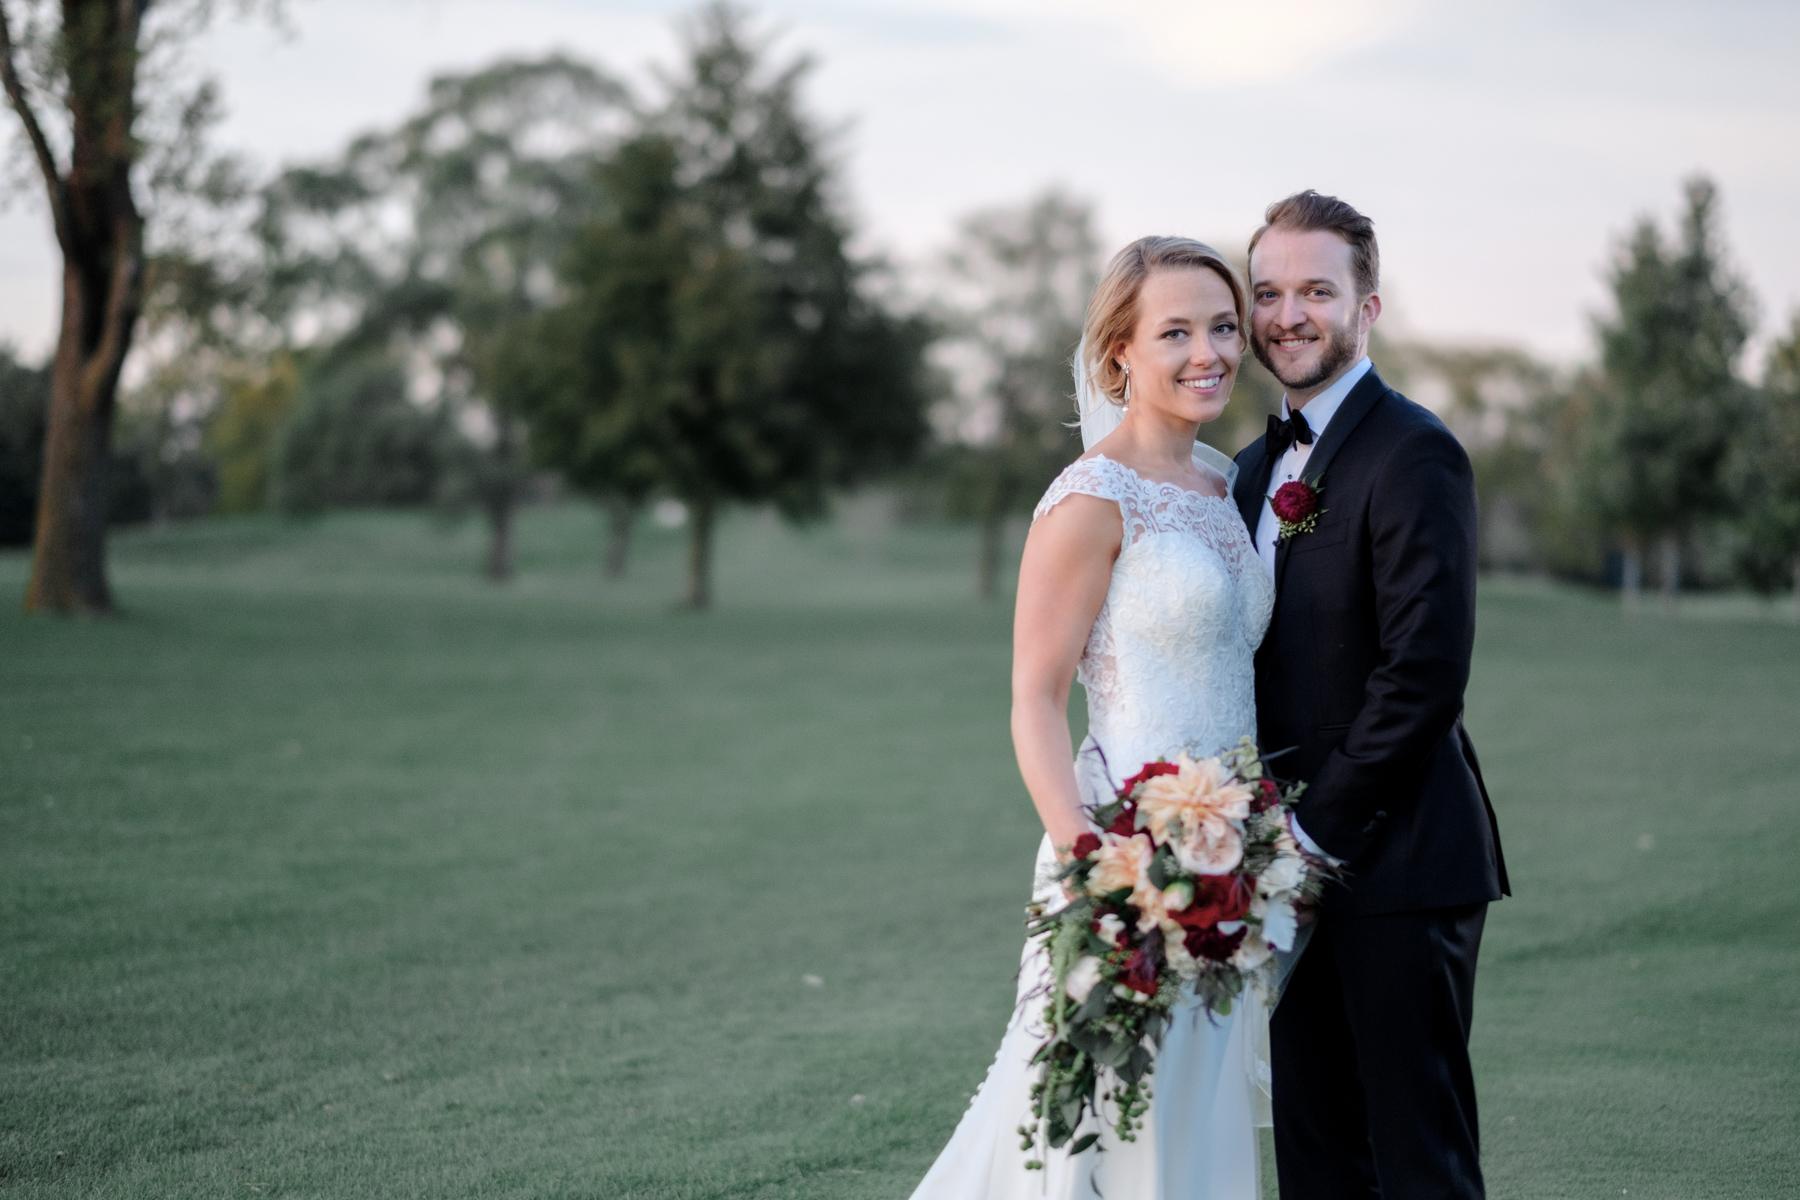 2017_BAP_KalliMatt_Gleneagles_CountryClub_Lemont_Wedding-62.jpg